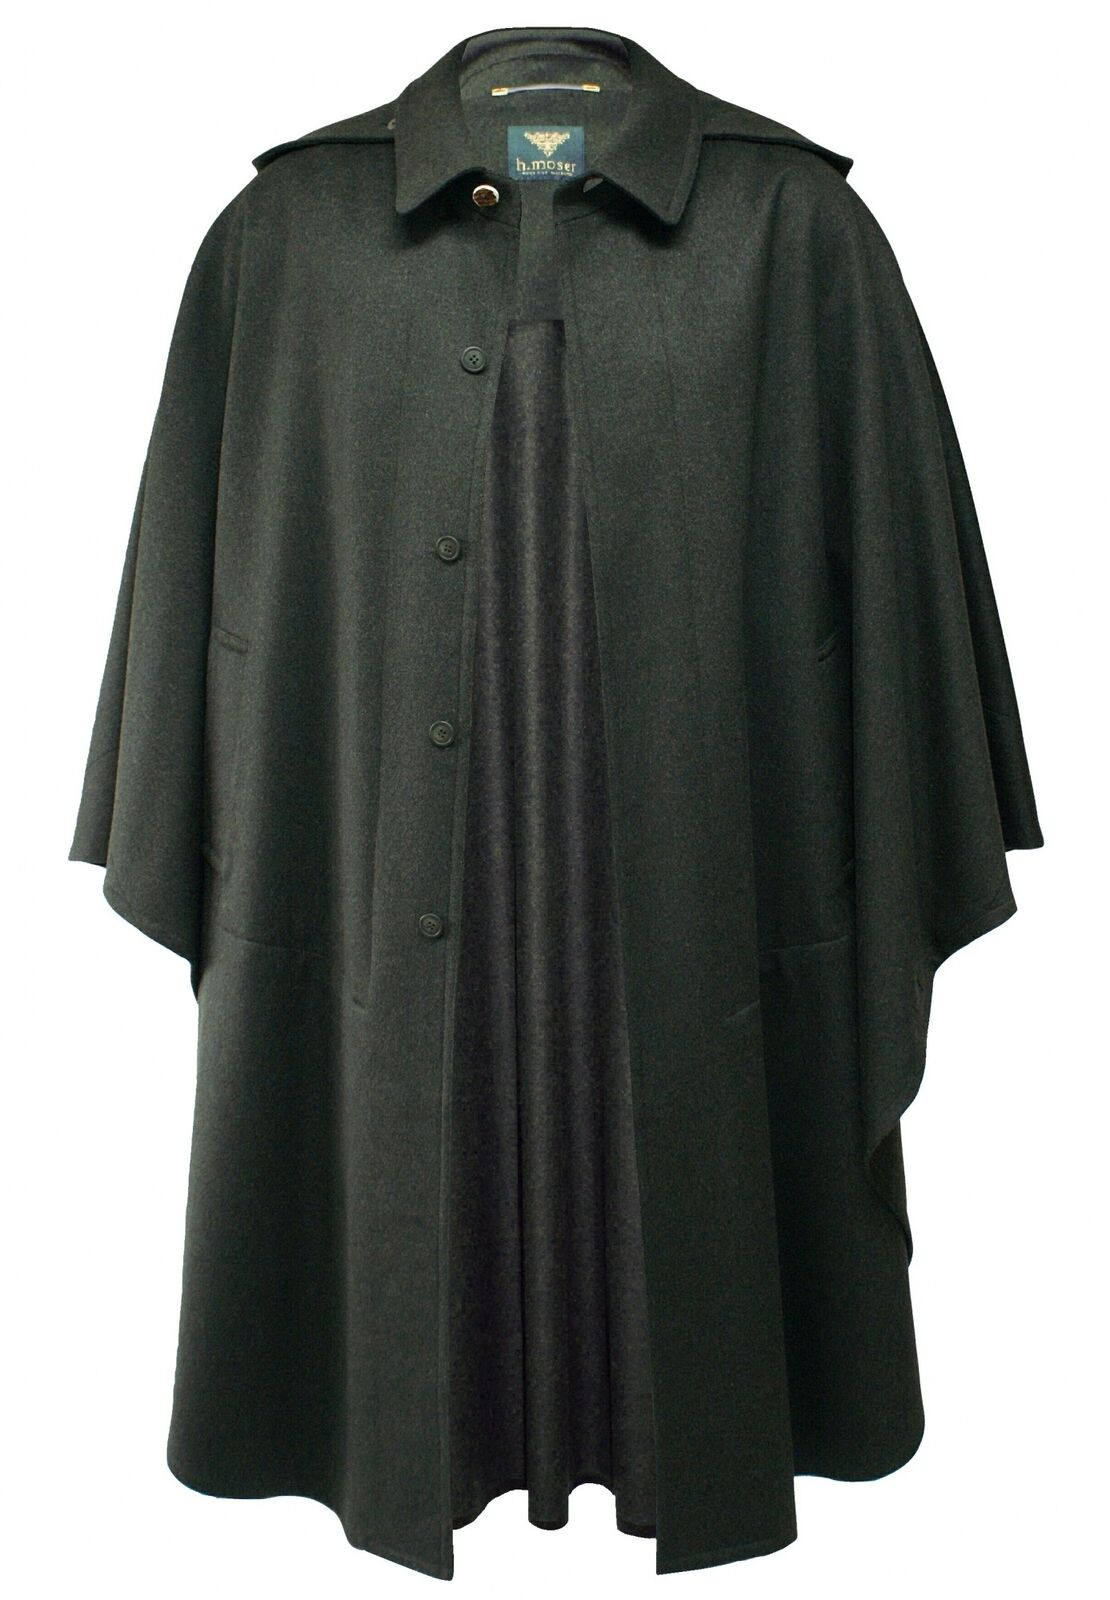 Mancha meteorológico verde loden capa Cape poncho caza abrigo capucha Trachten abrigo